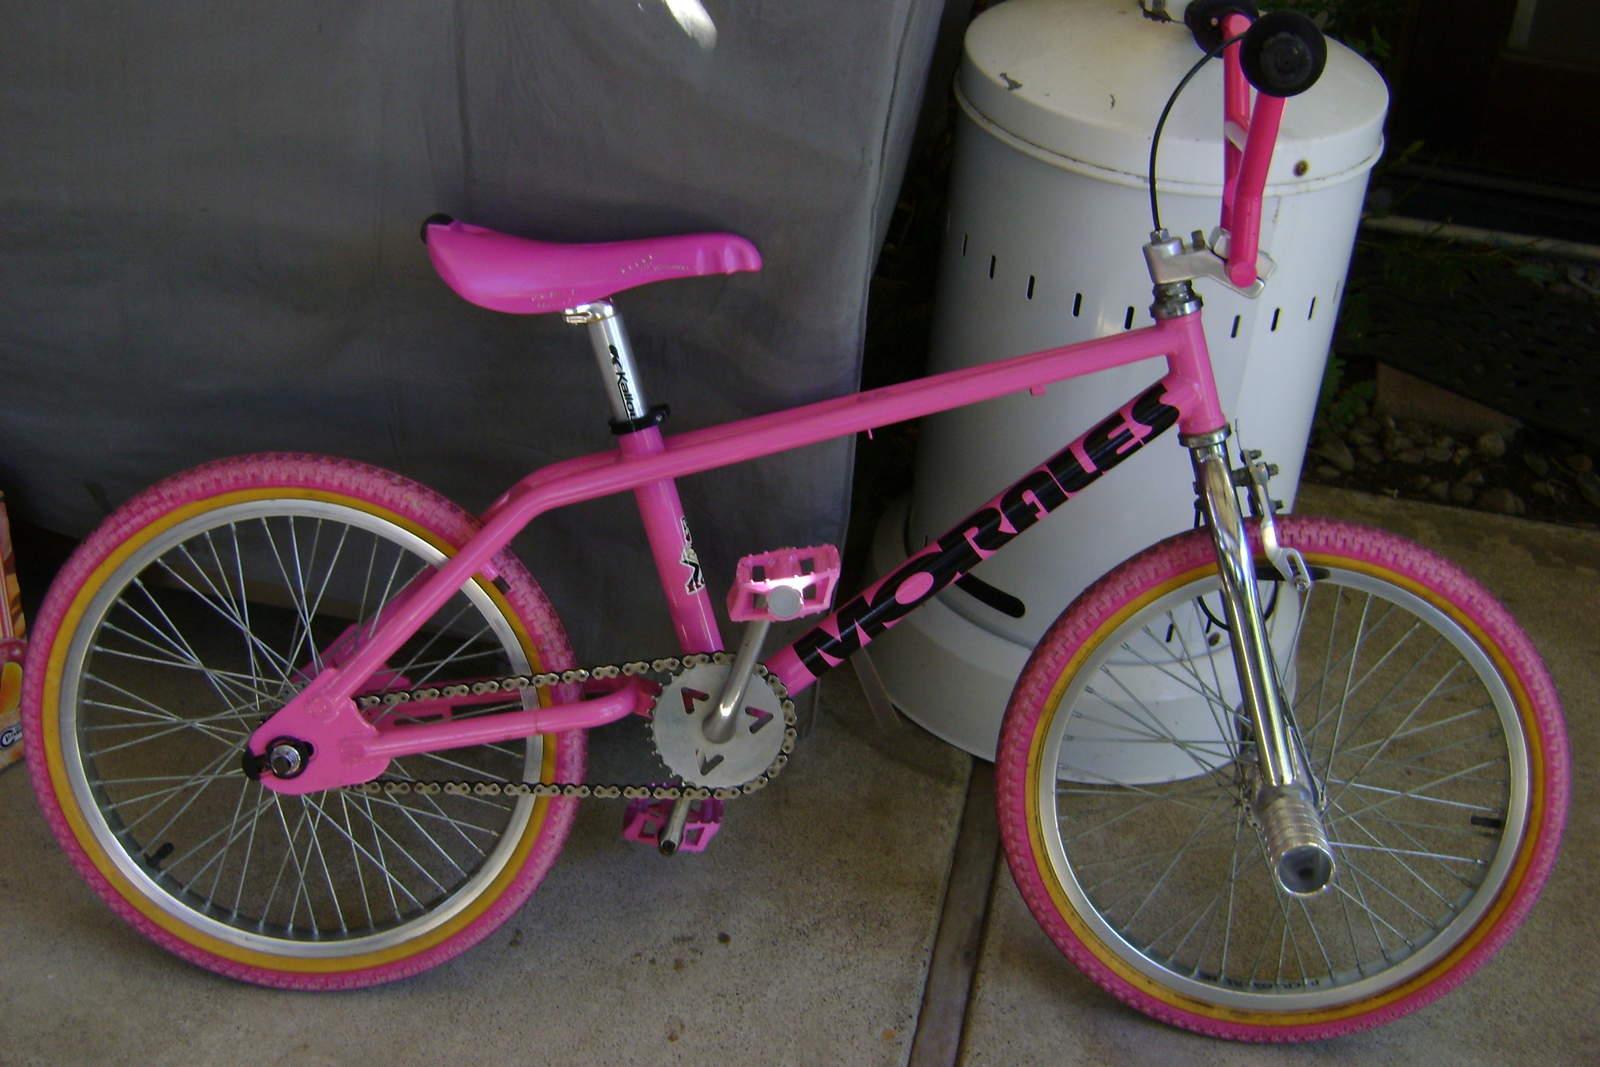 http://uploads.bmxmuseum.com/user-images/6905/bikes-freestyle-0575968fa8f8d.jpg